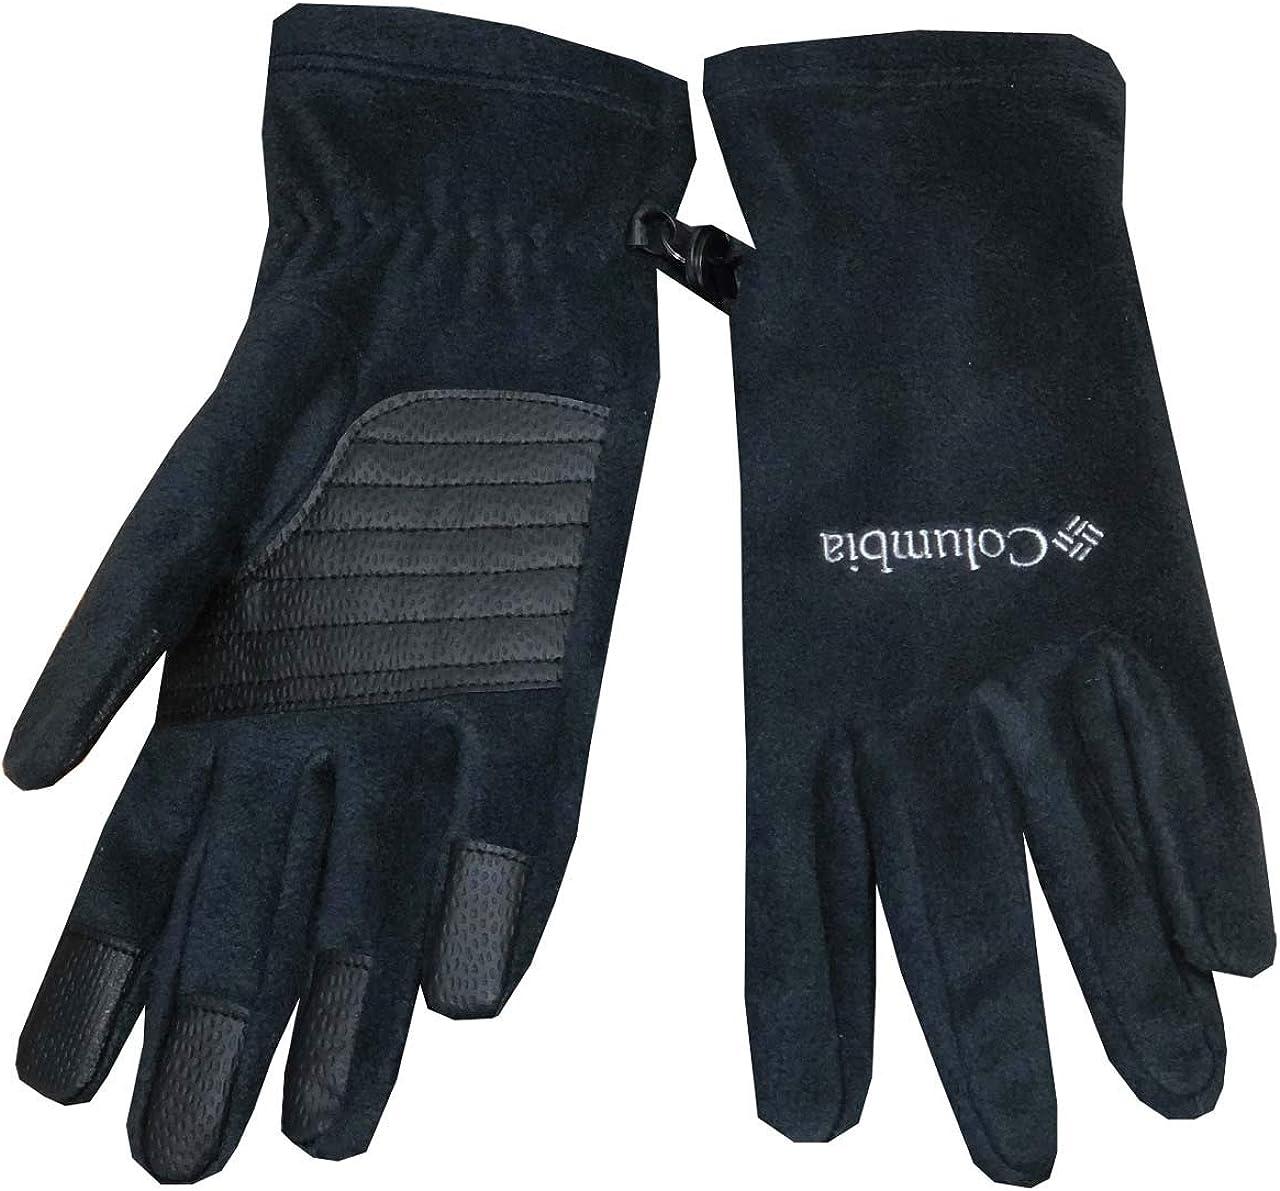 Columbia Women Agent Heat III Omni-Heat Thermal Reflective Fleece Gloves